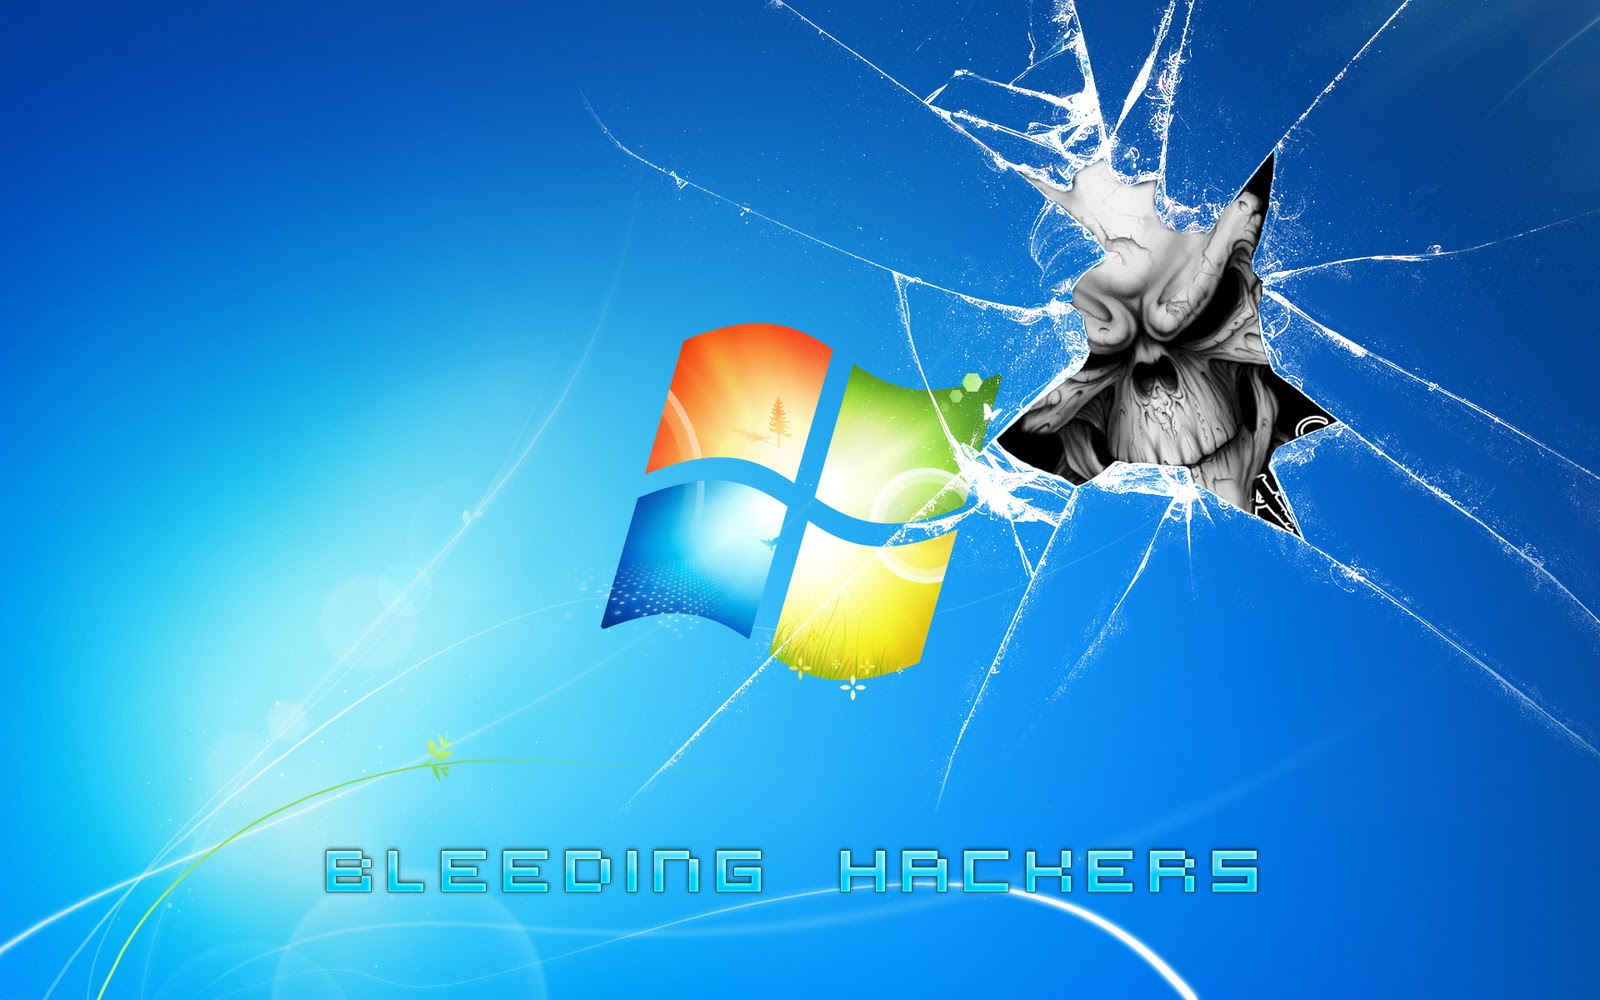 Exit hacker wallpaper hacker for Sfondi hd per pc